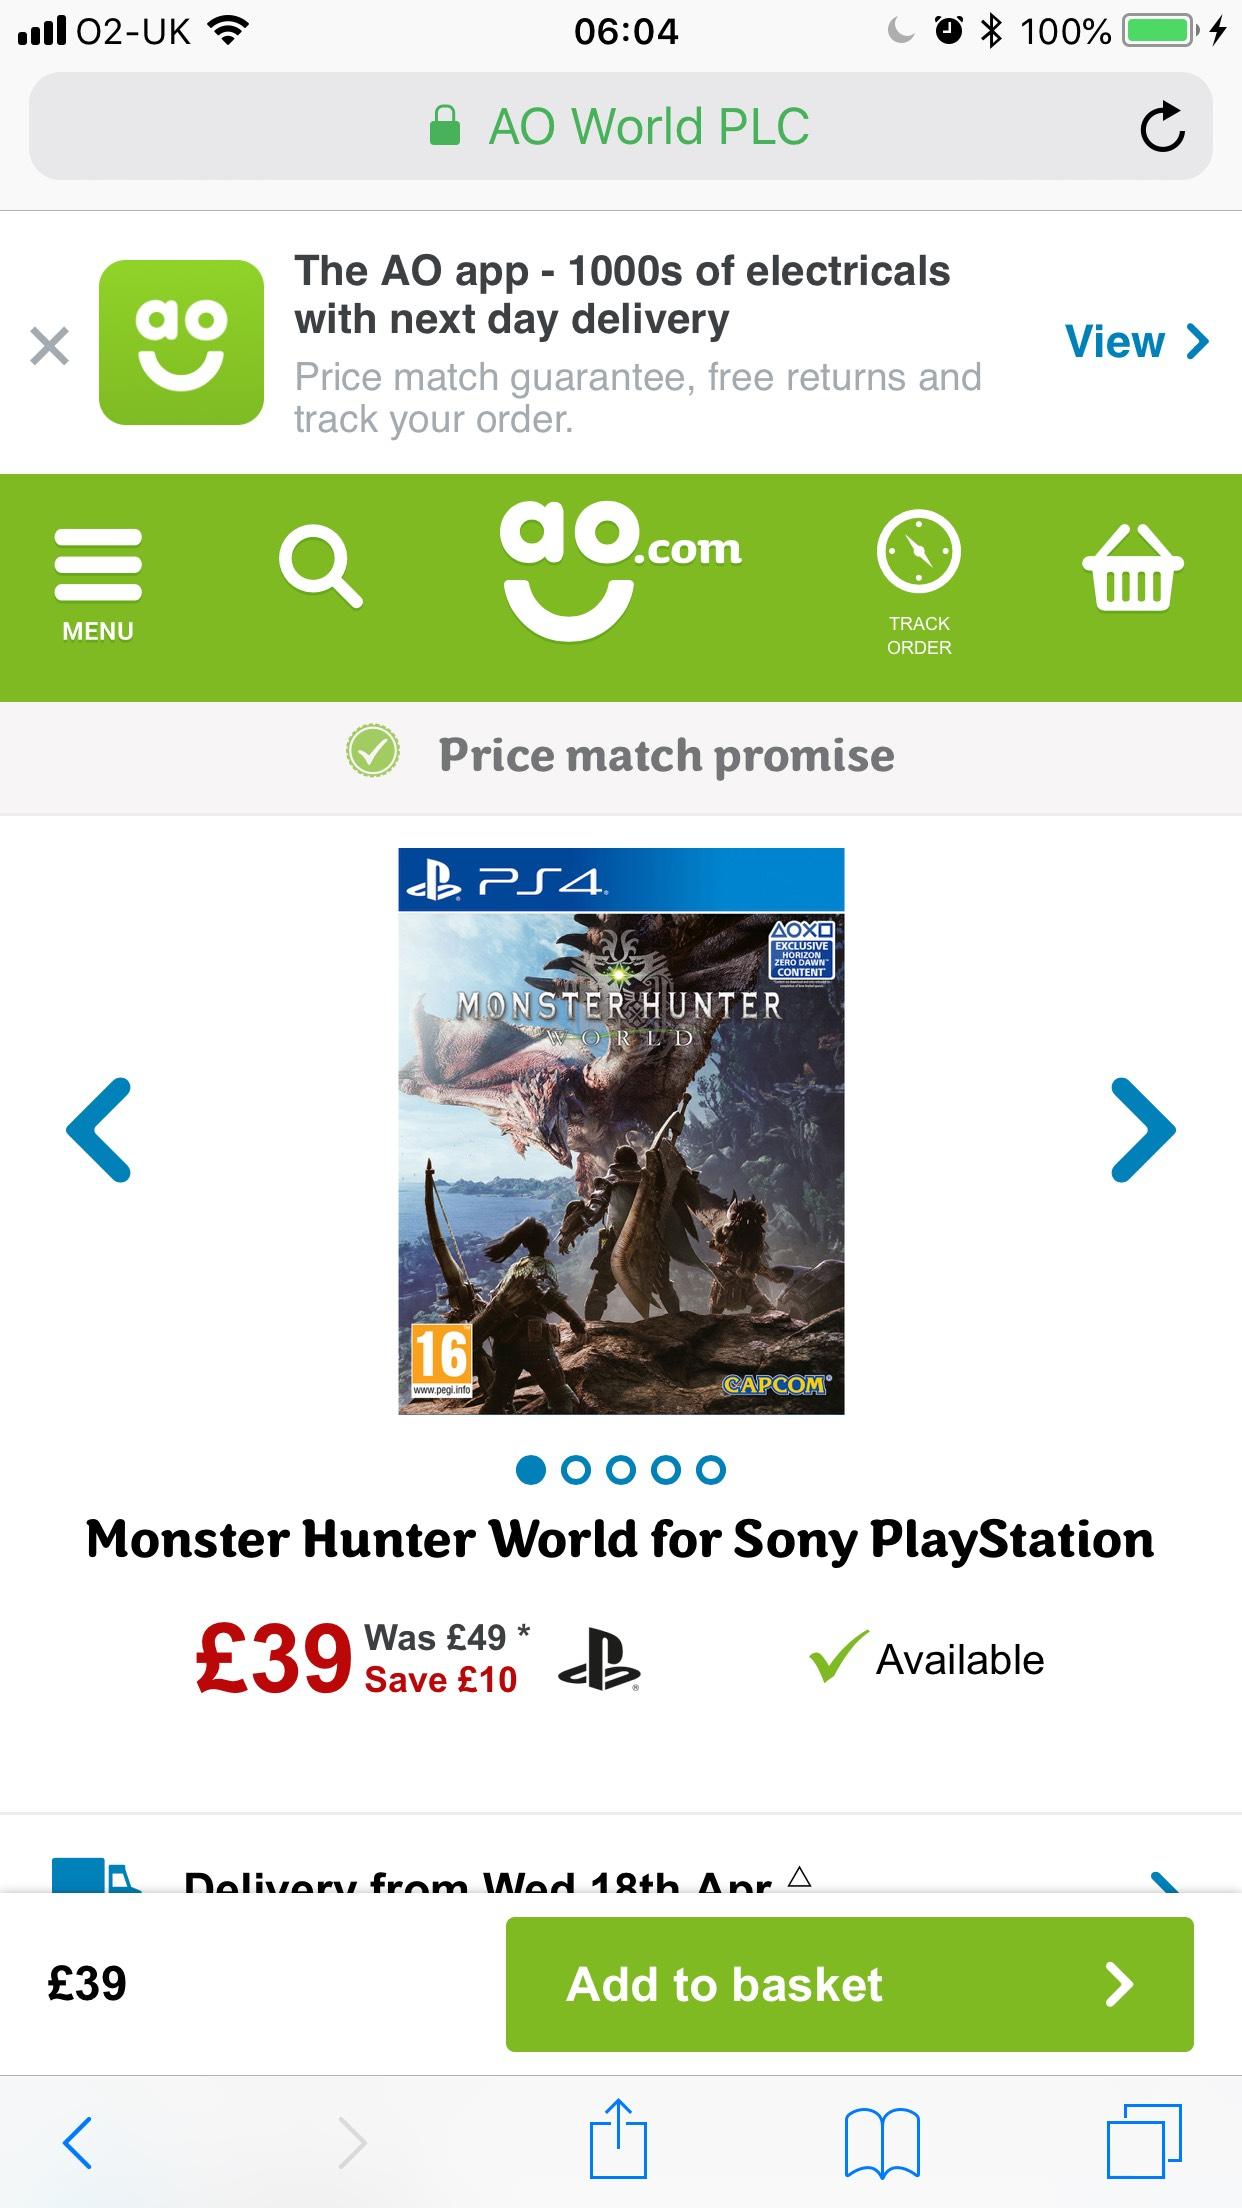 Monster Hunter World for Sony PlayStation £39 @ AO